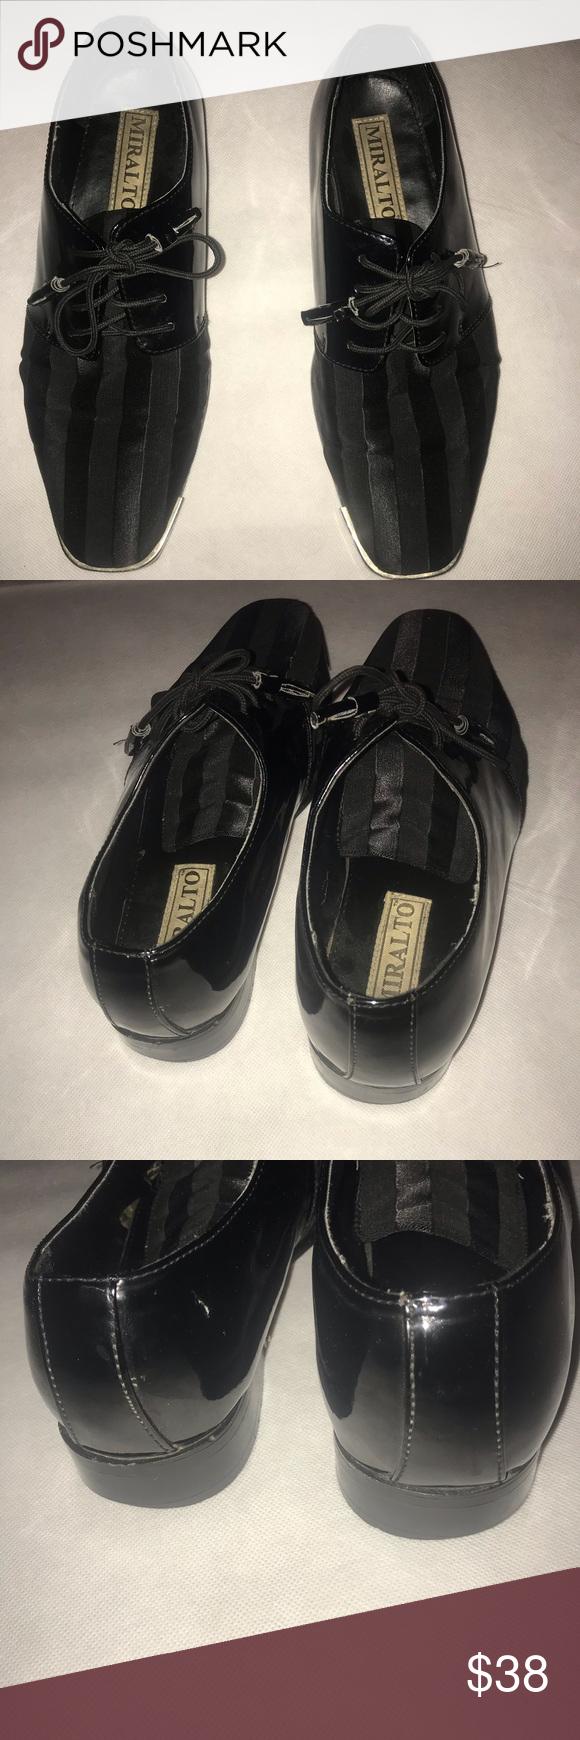 Tuxedo shoes, Vegan shoes, Vegan leather